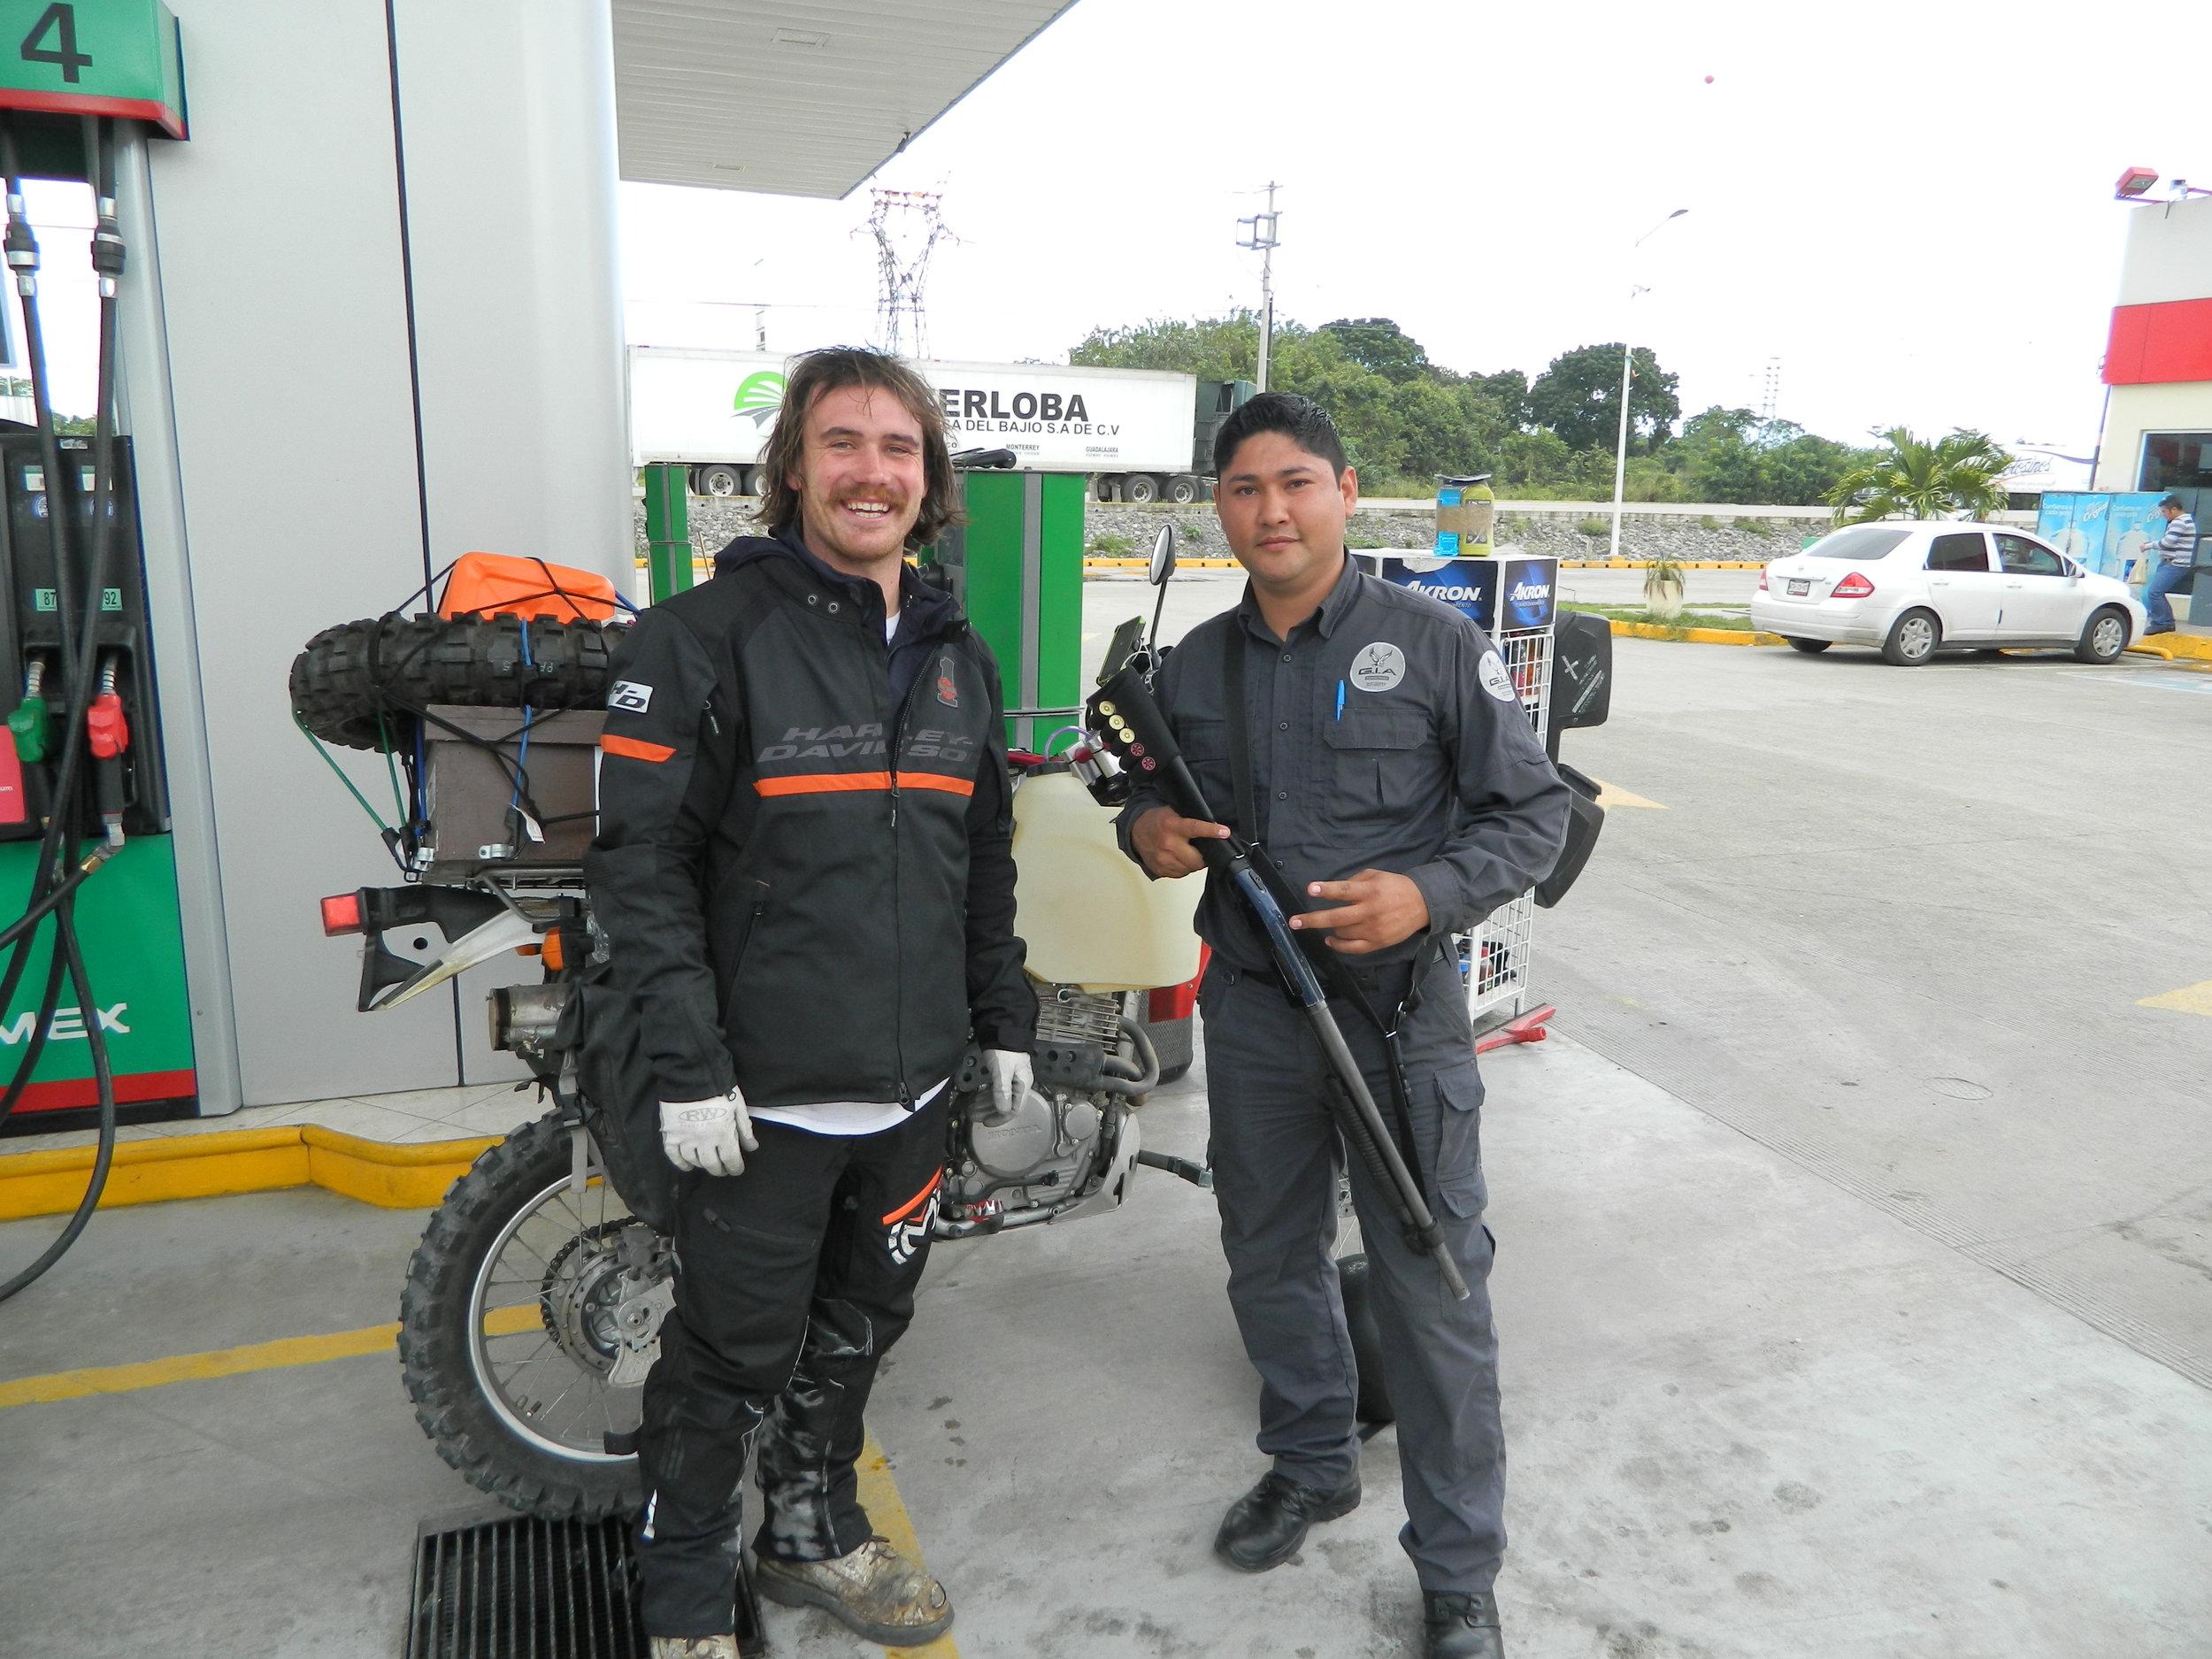 Buying Gas in Vera Cruz